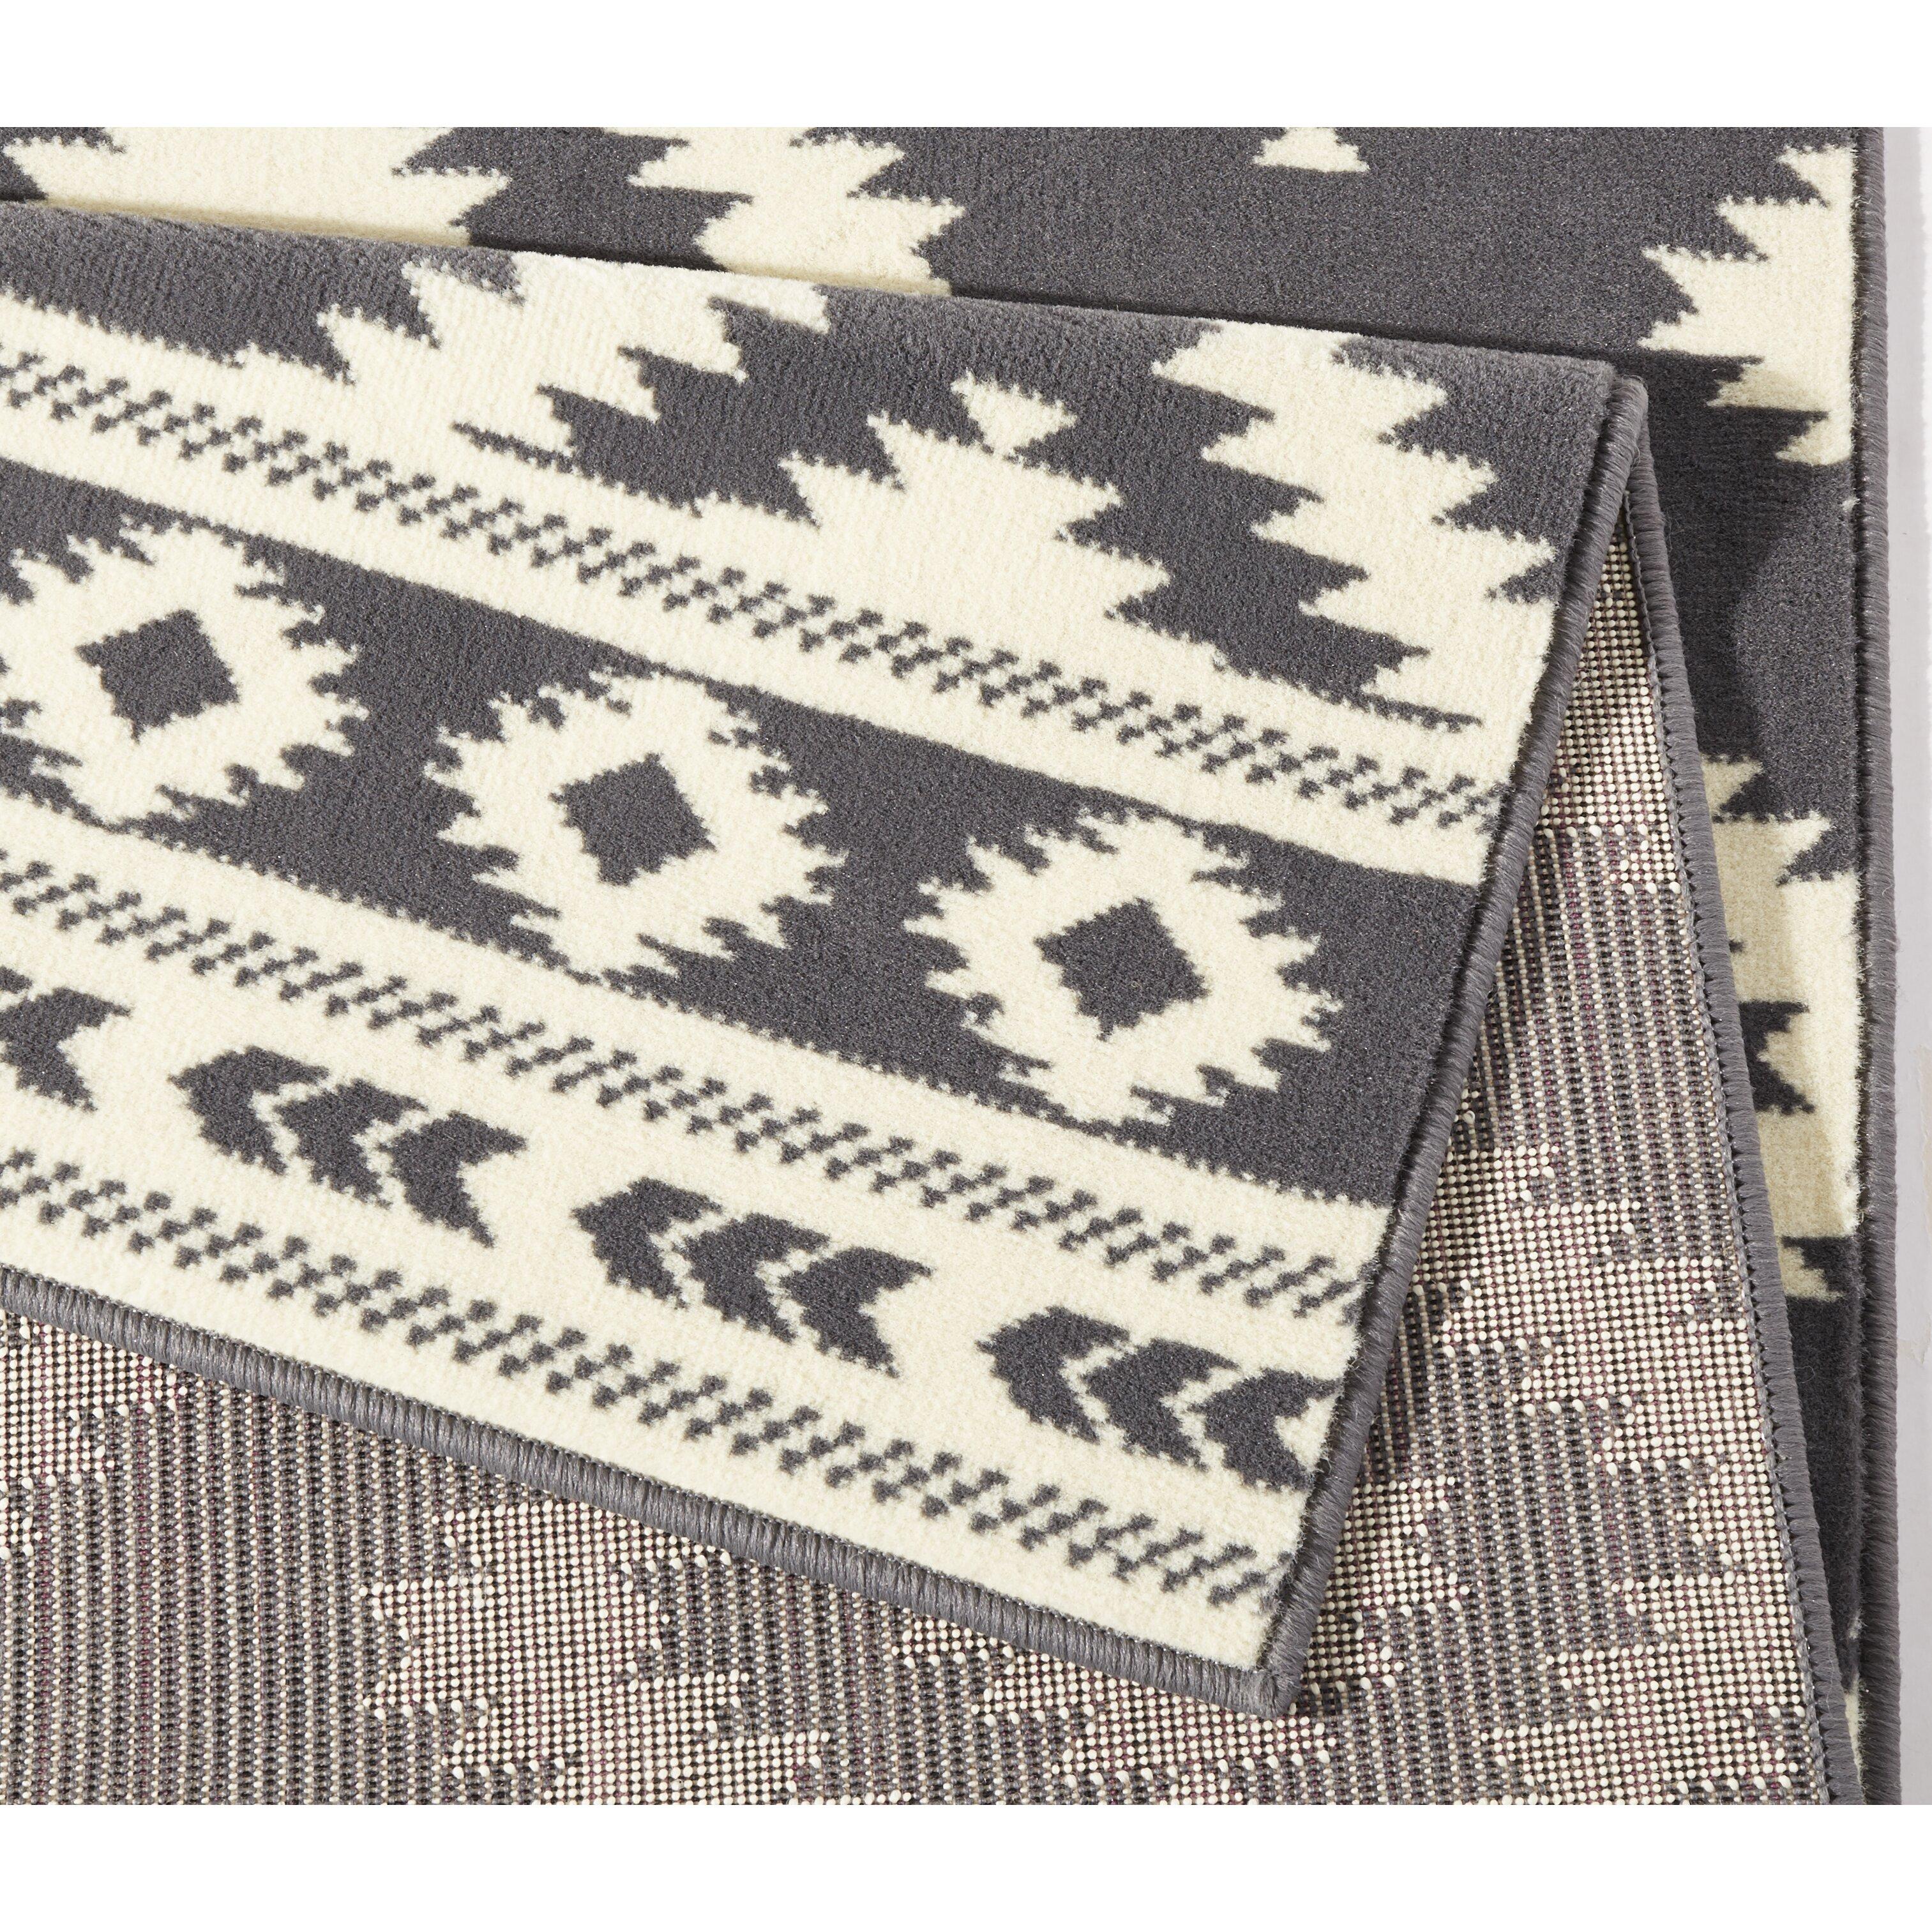 hanse home teppich ethno in grau creme. Black Bedroom Furniture Sets. Home Design Ideas